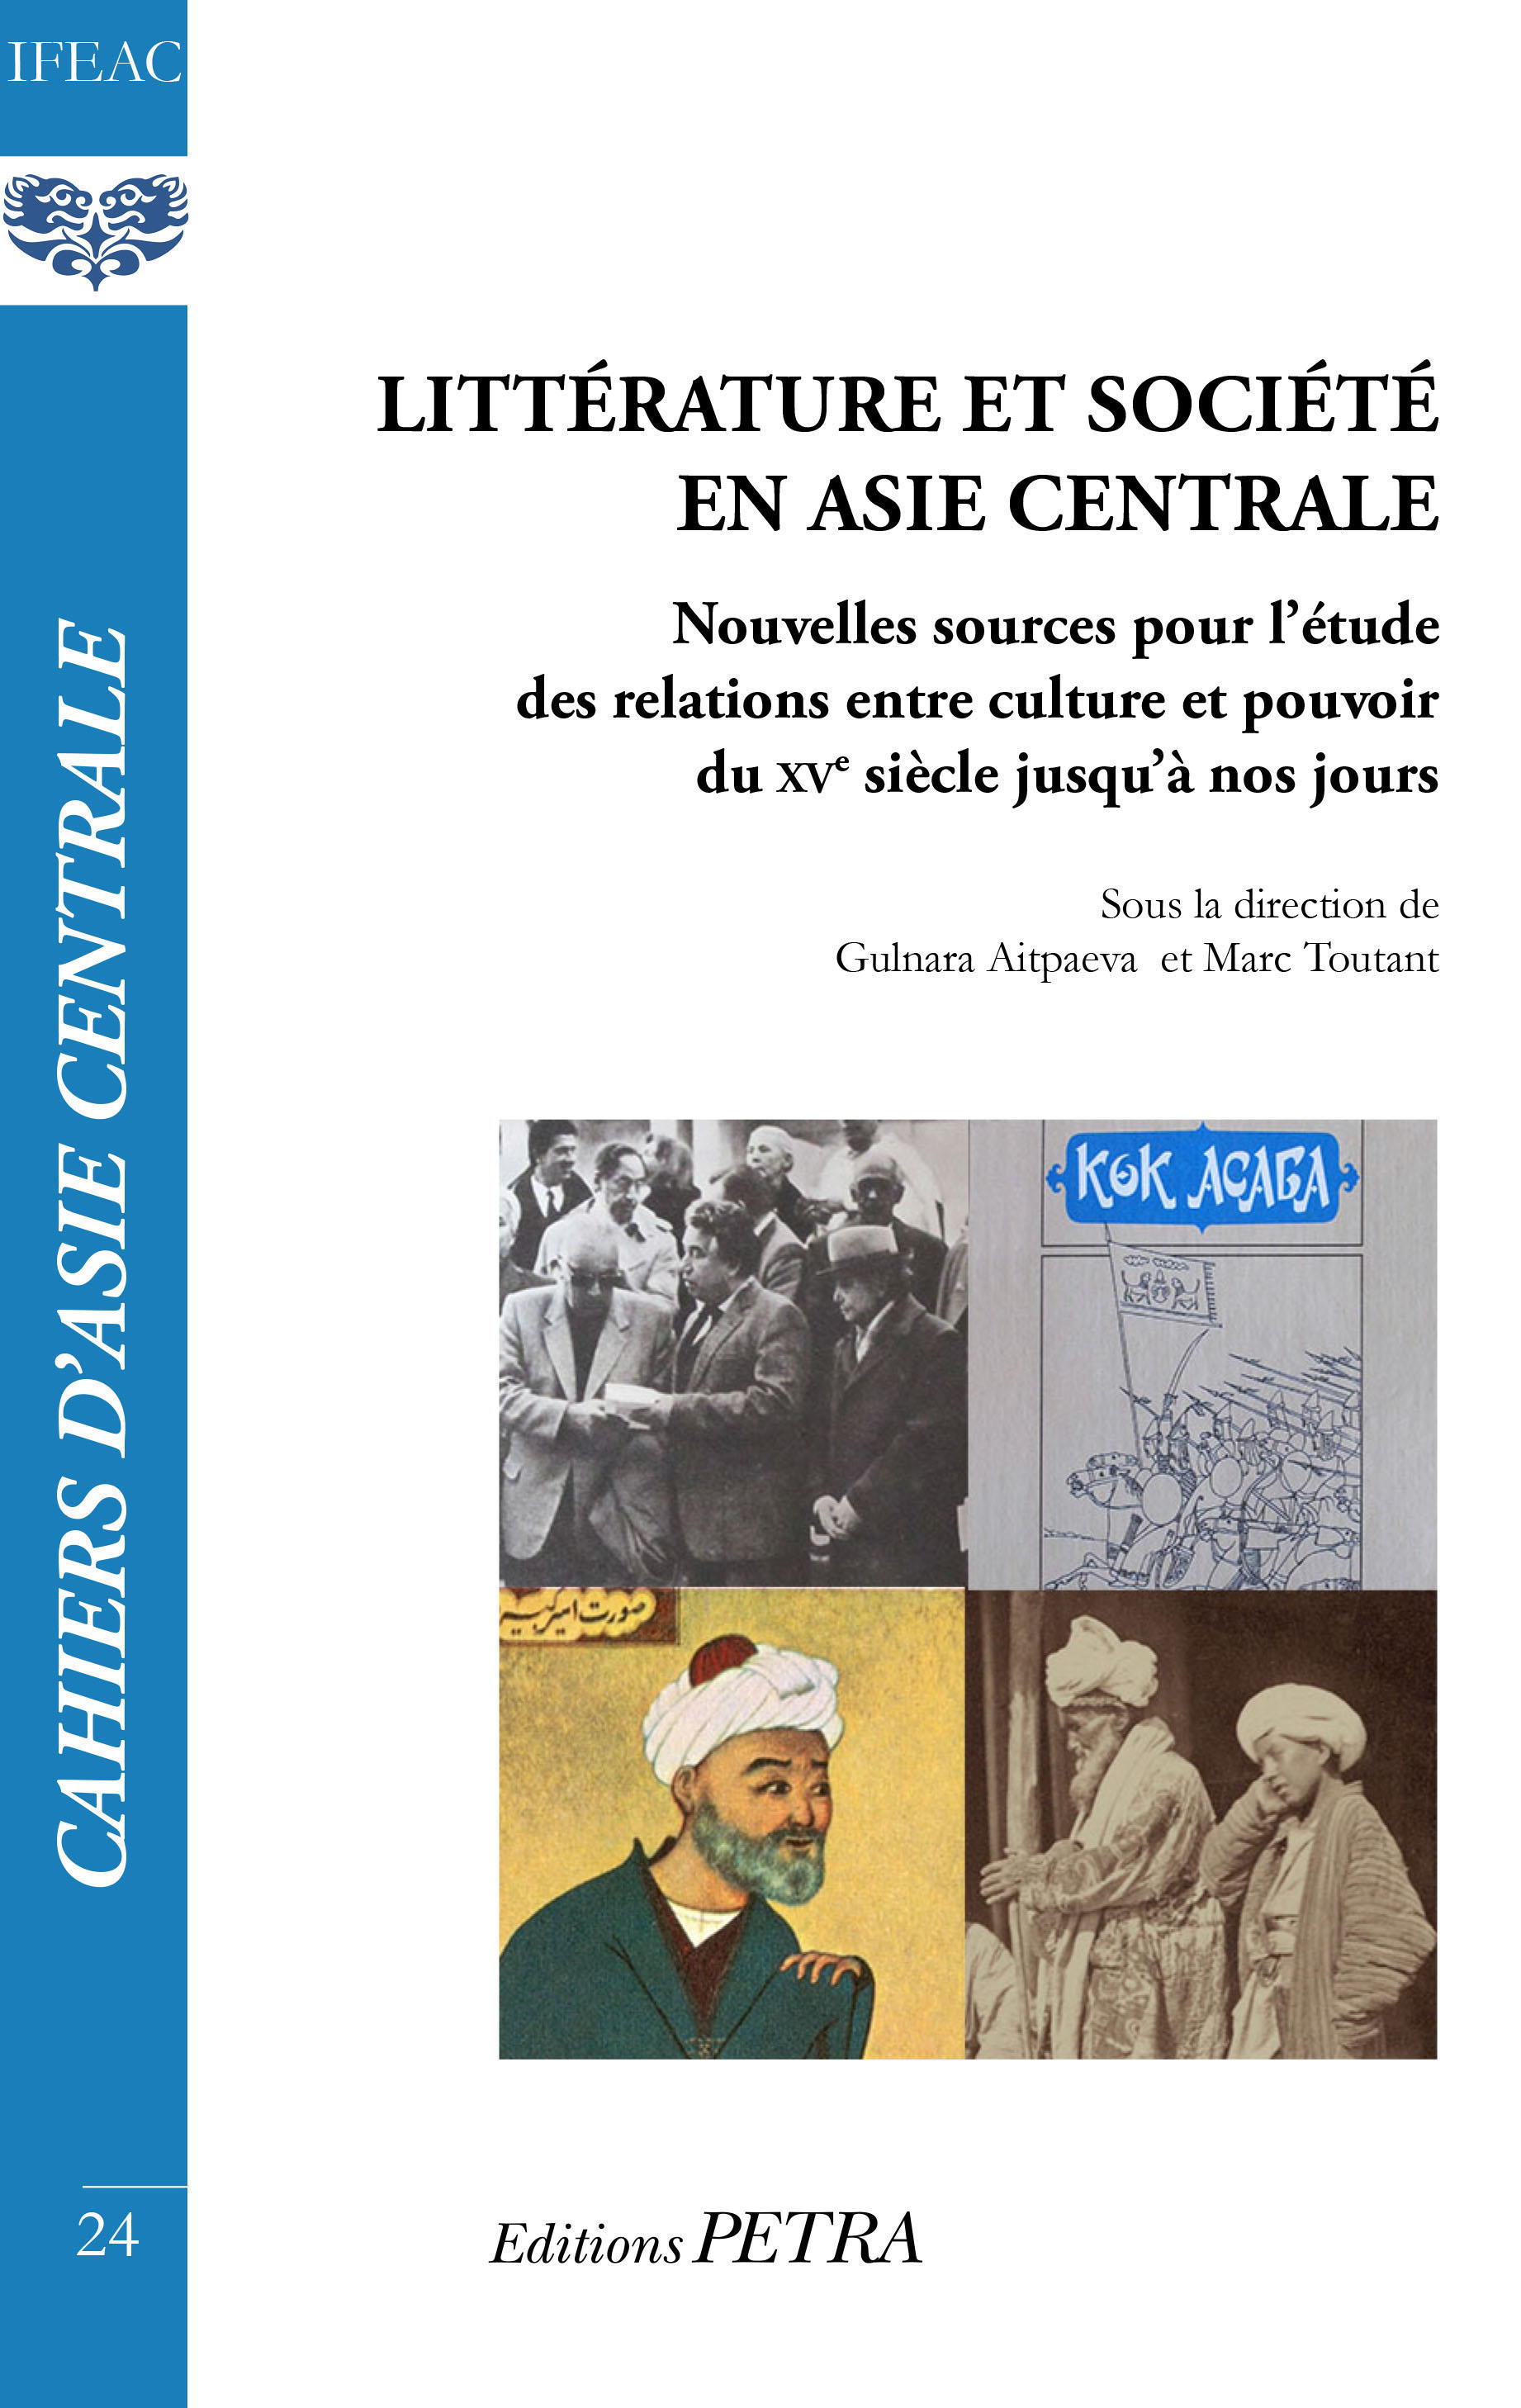 Cahiers d'Asie centrale n°24